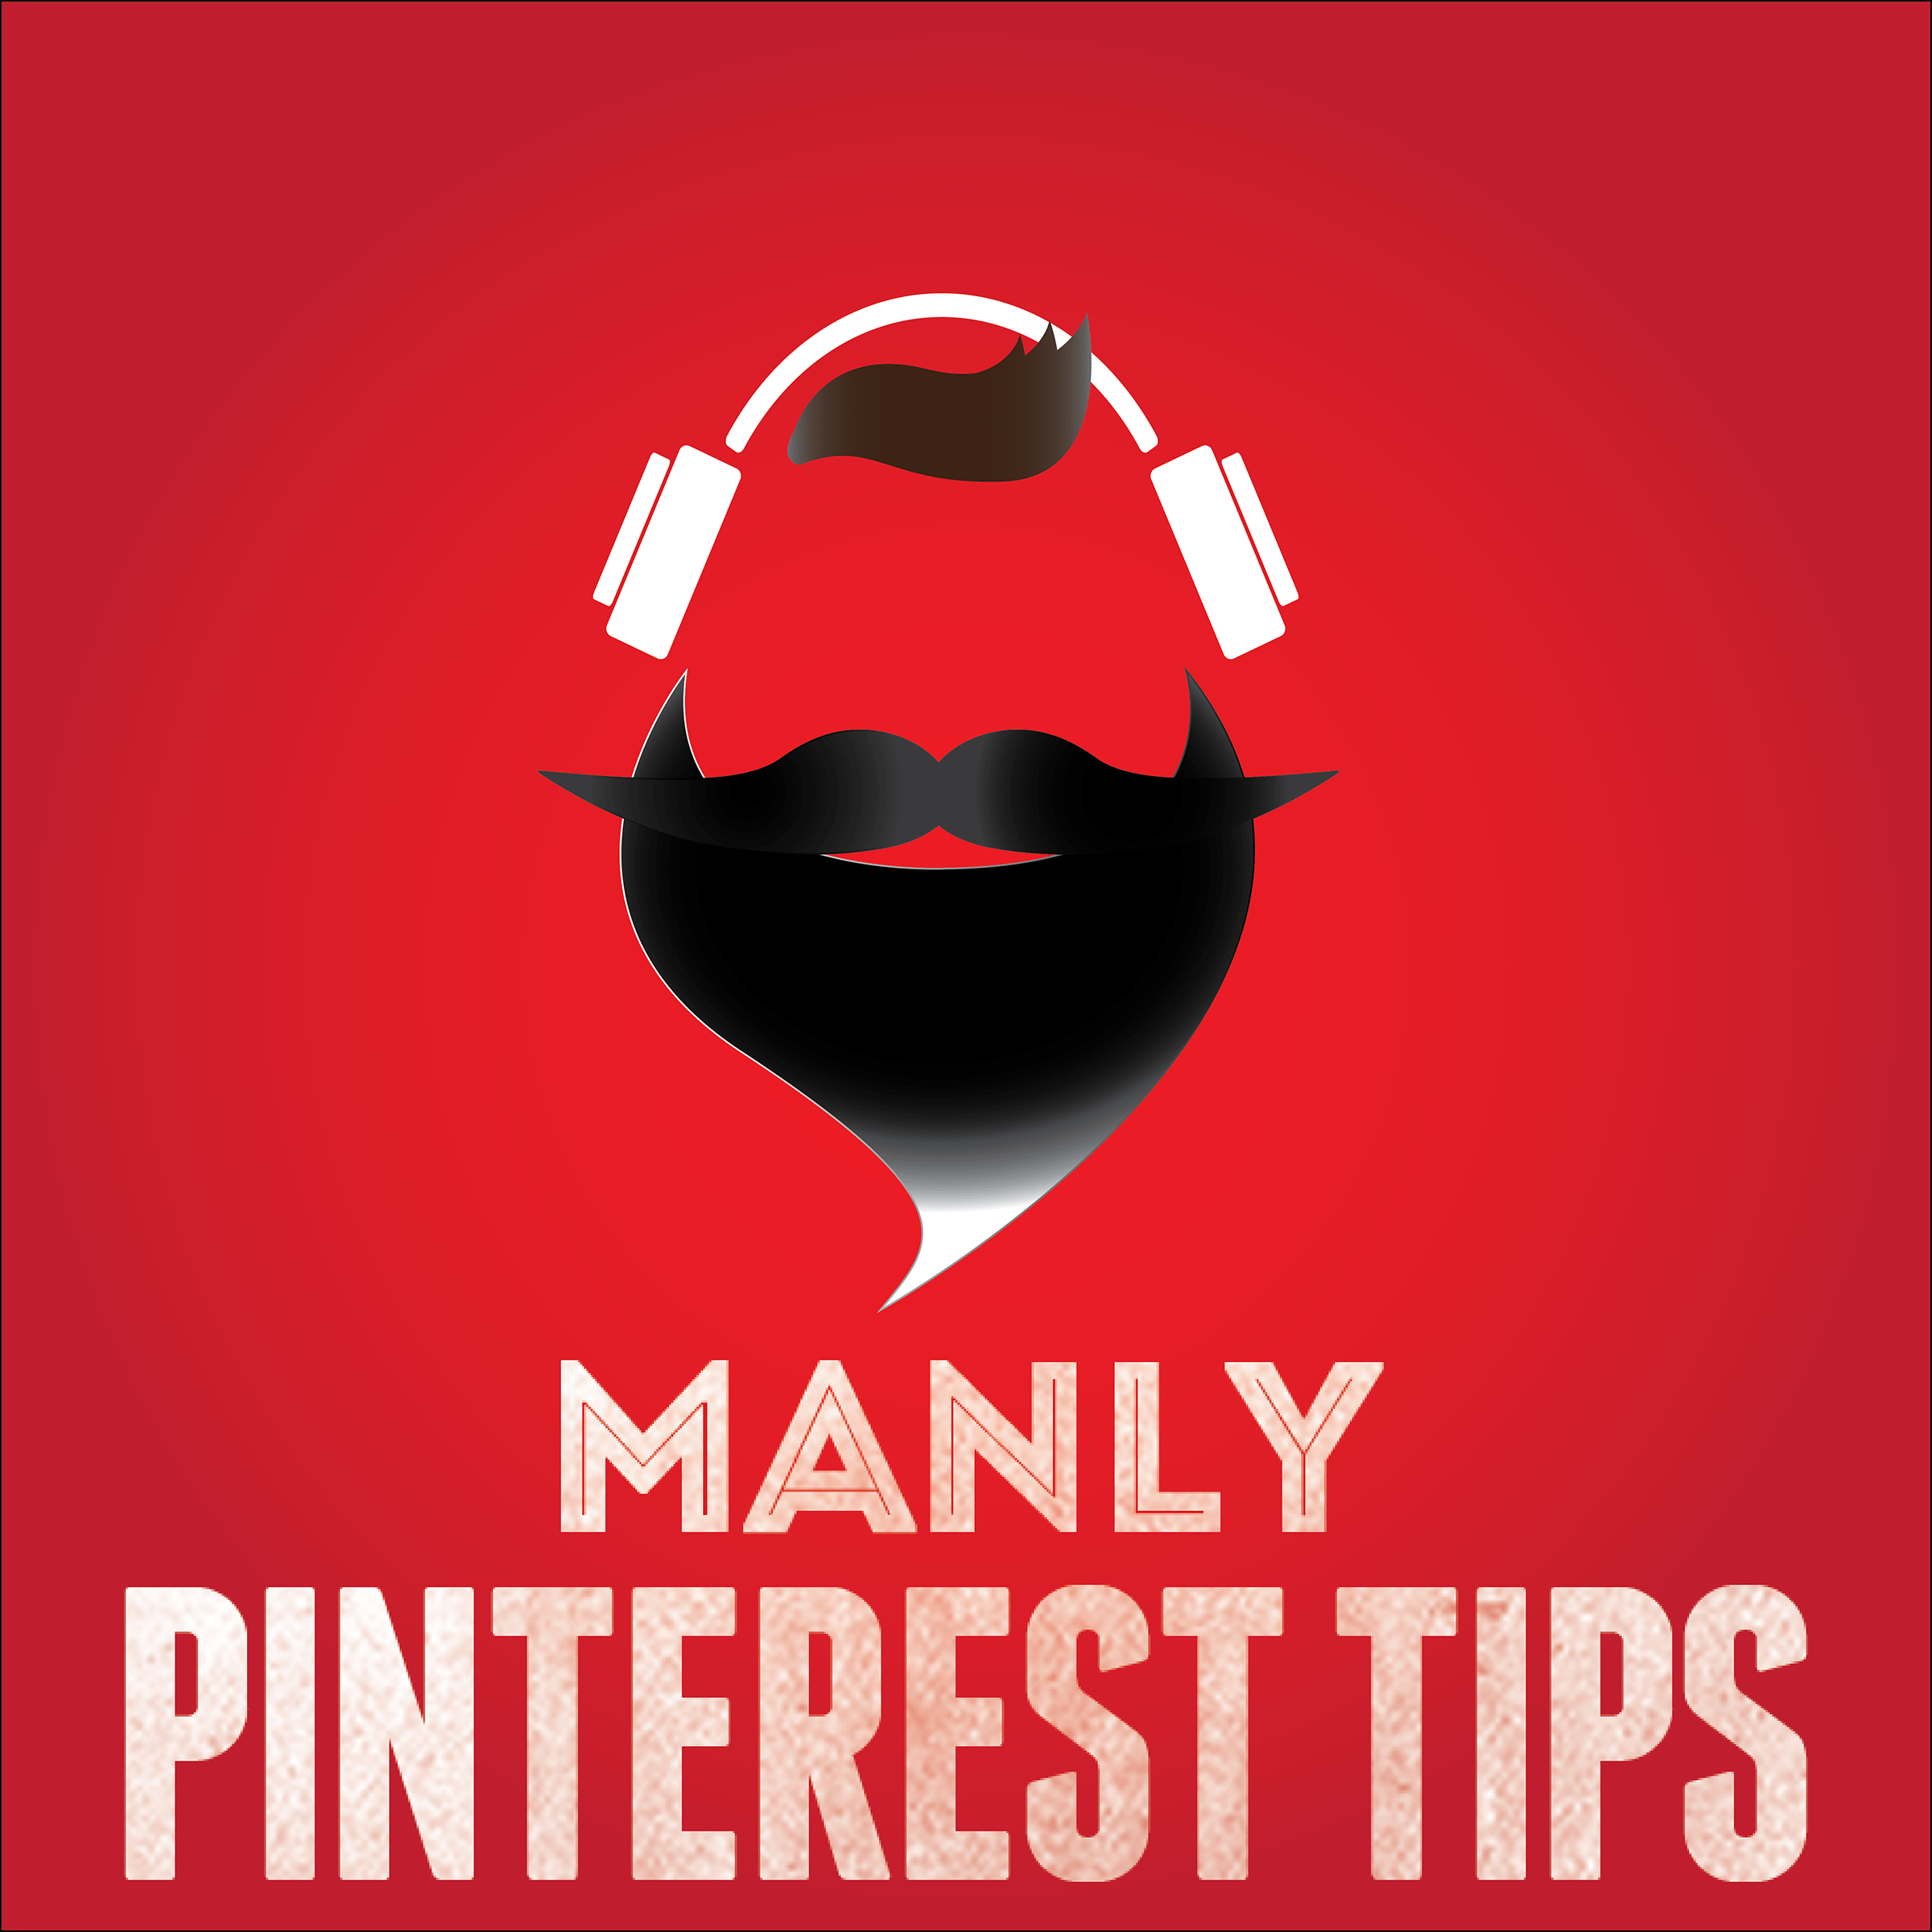 manly-pinterest-tips-podcast